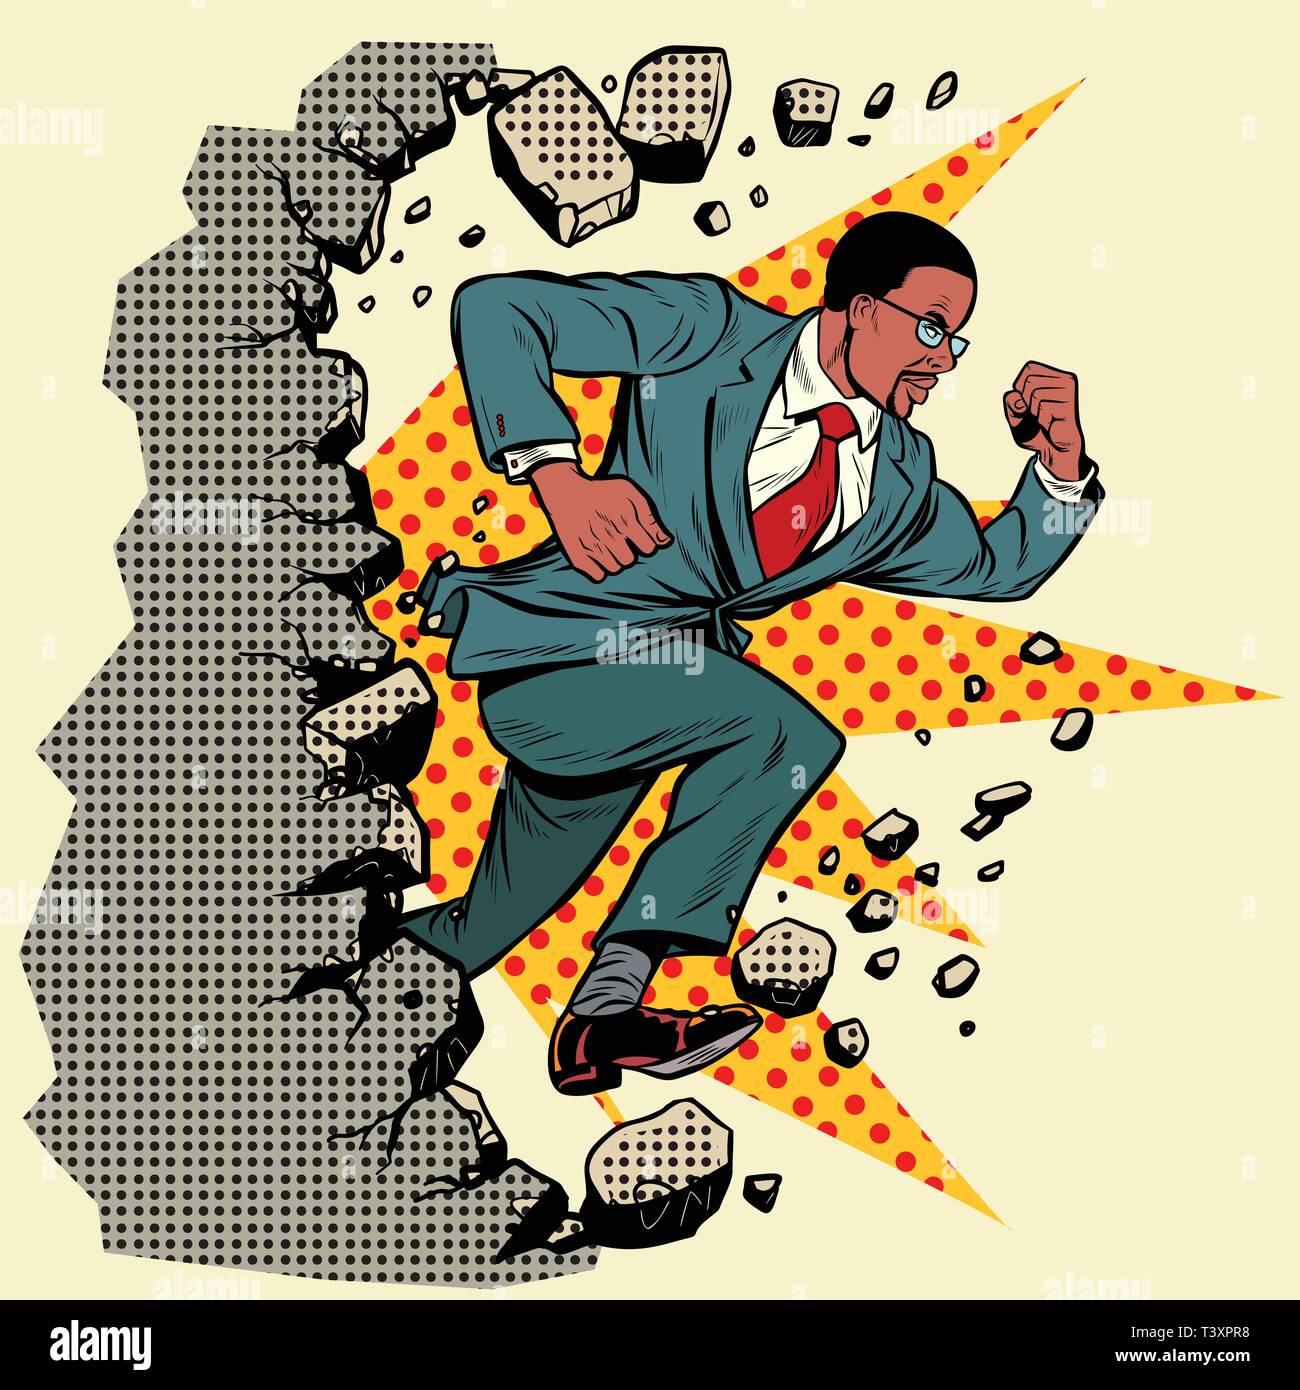 Leader african businessman breaks a wall, destroys stereotypes. Moving forward, personal development. Pop art retro vector illustration vintage kitsch - Stock Vector